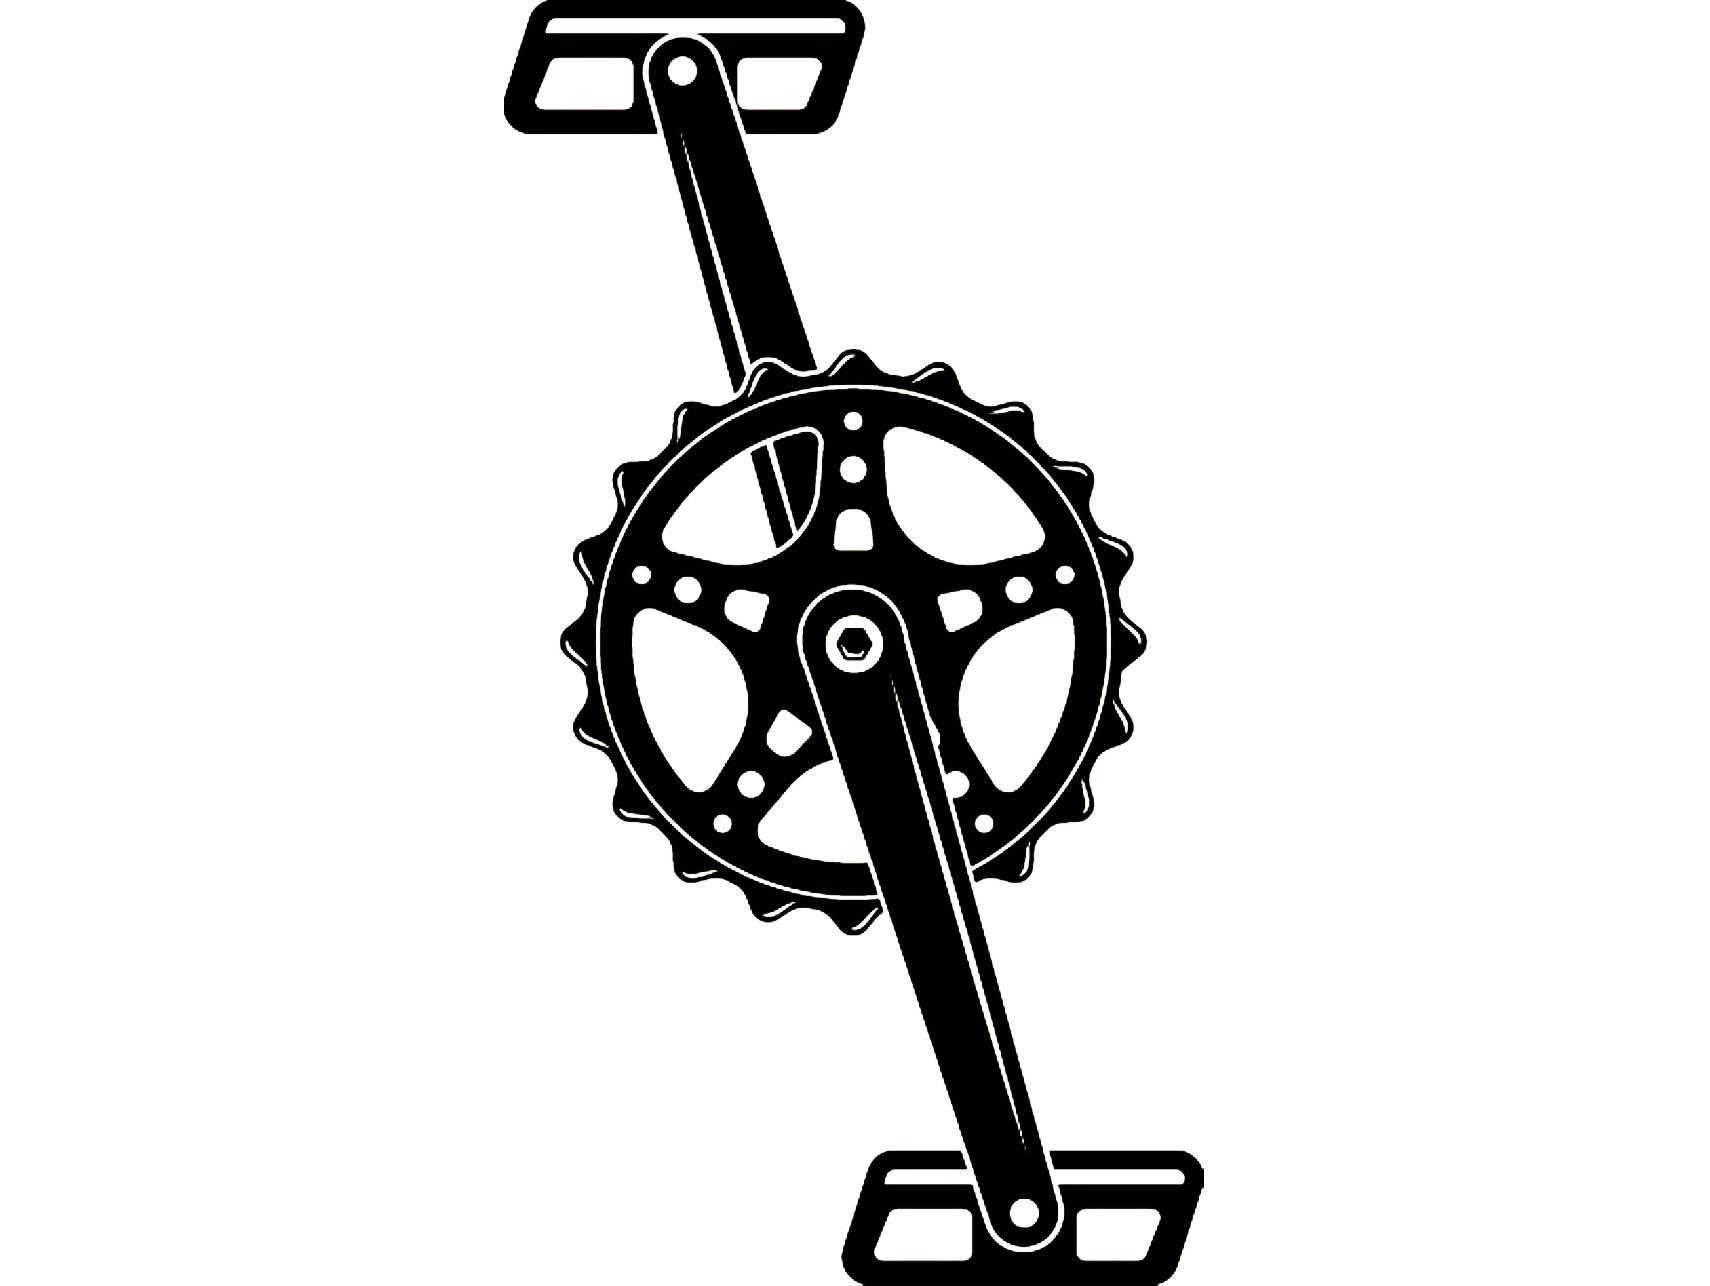 1710x1286 Bicycle Crank 1 Pedal Cycle Cycling Bike Beach Cruiser Race Etsy